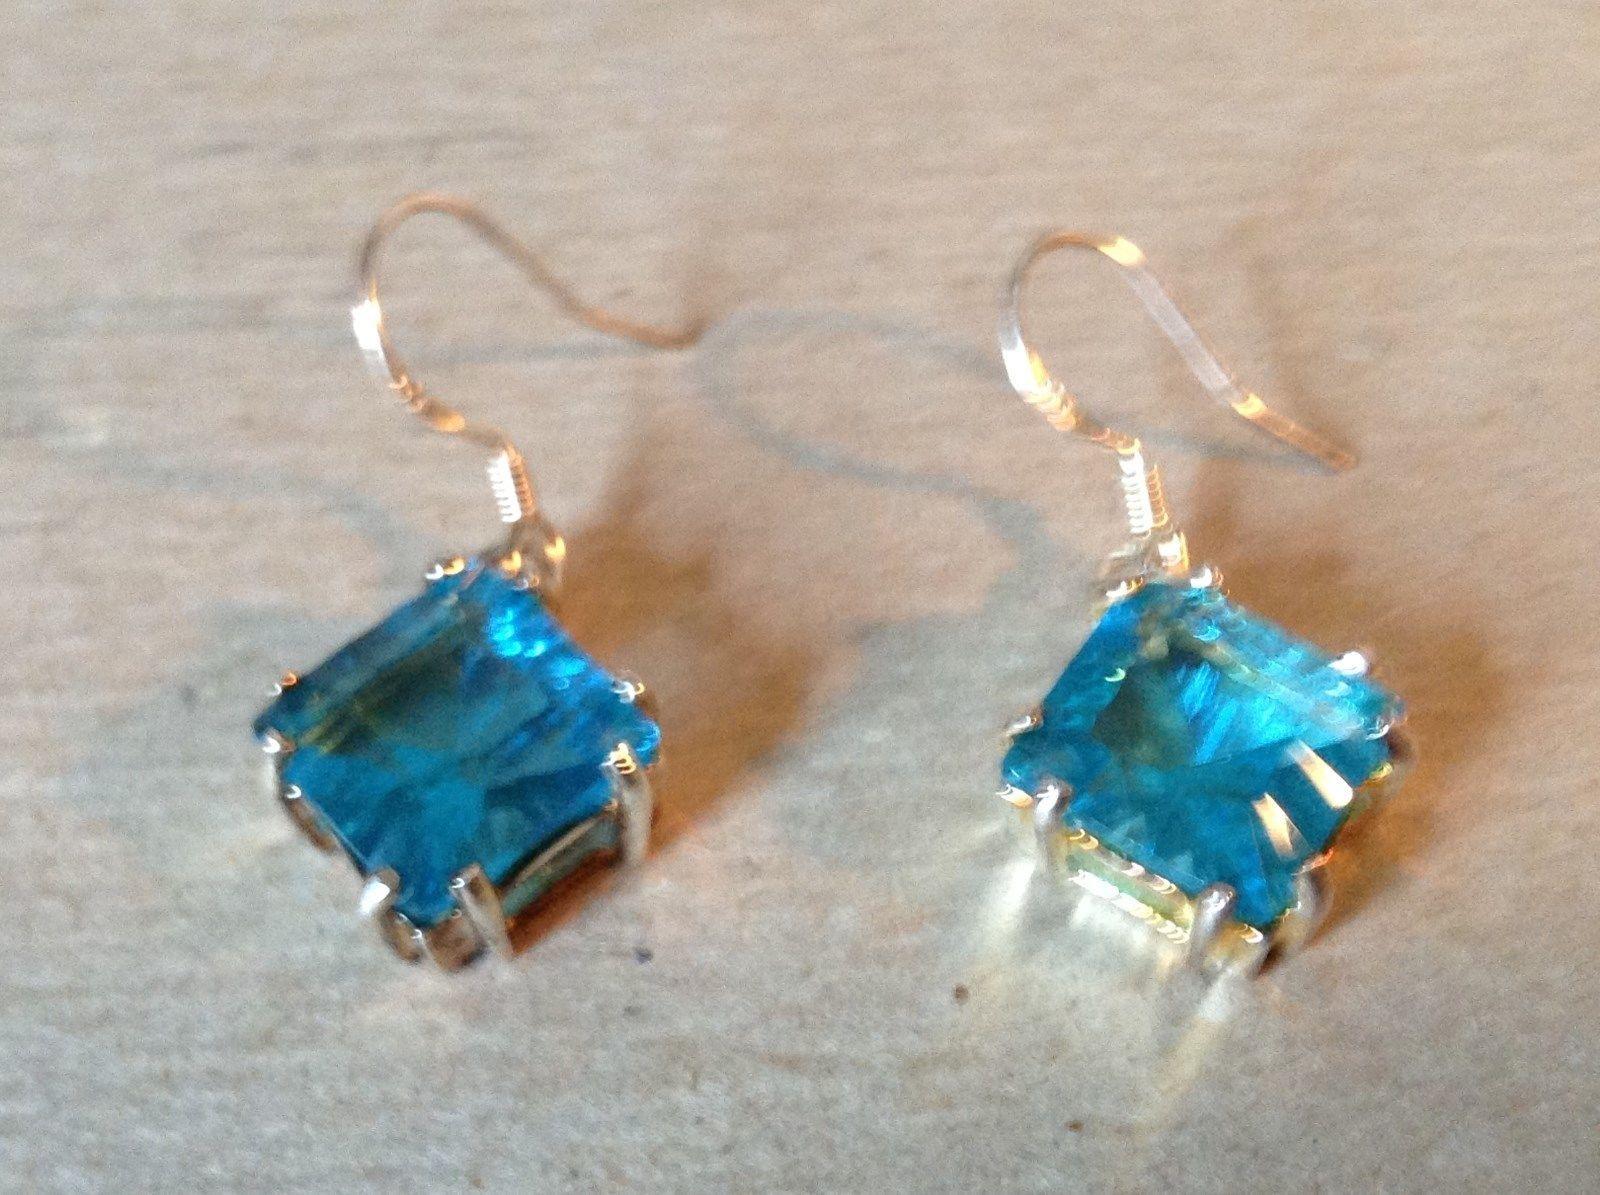 Light Blue Square Crystal Dangling Earrings Set in 925 Sterling Silver